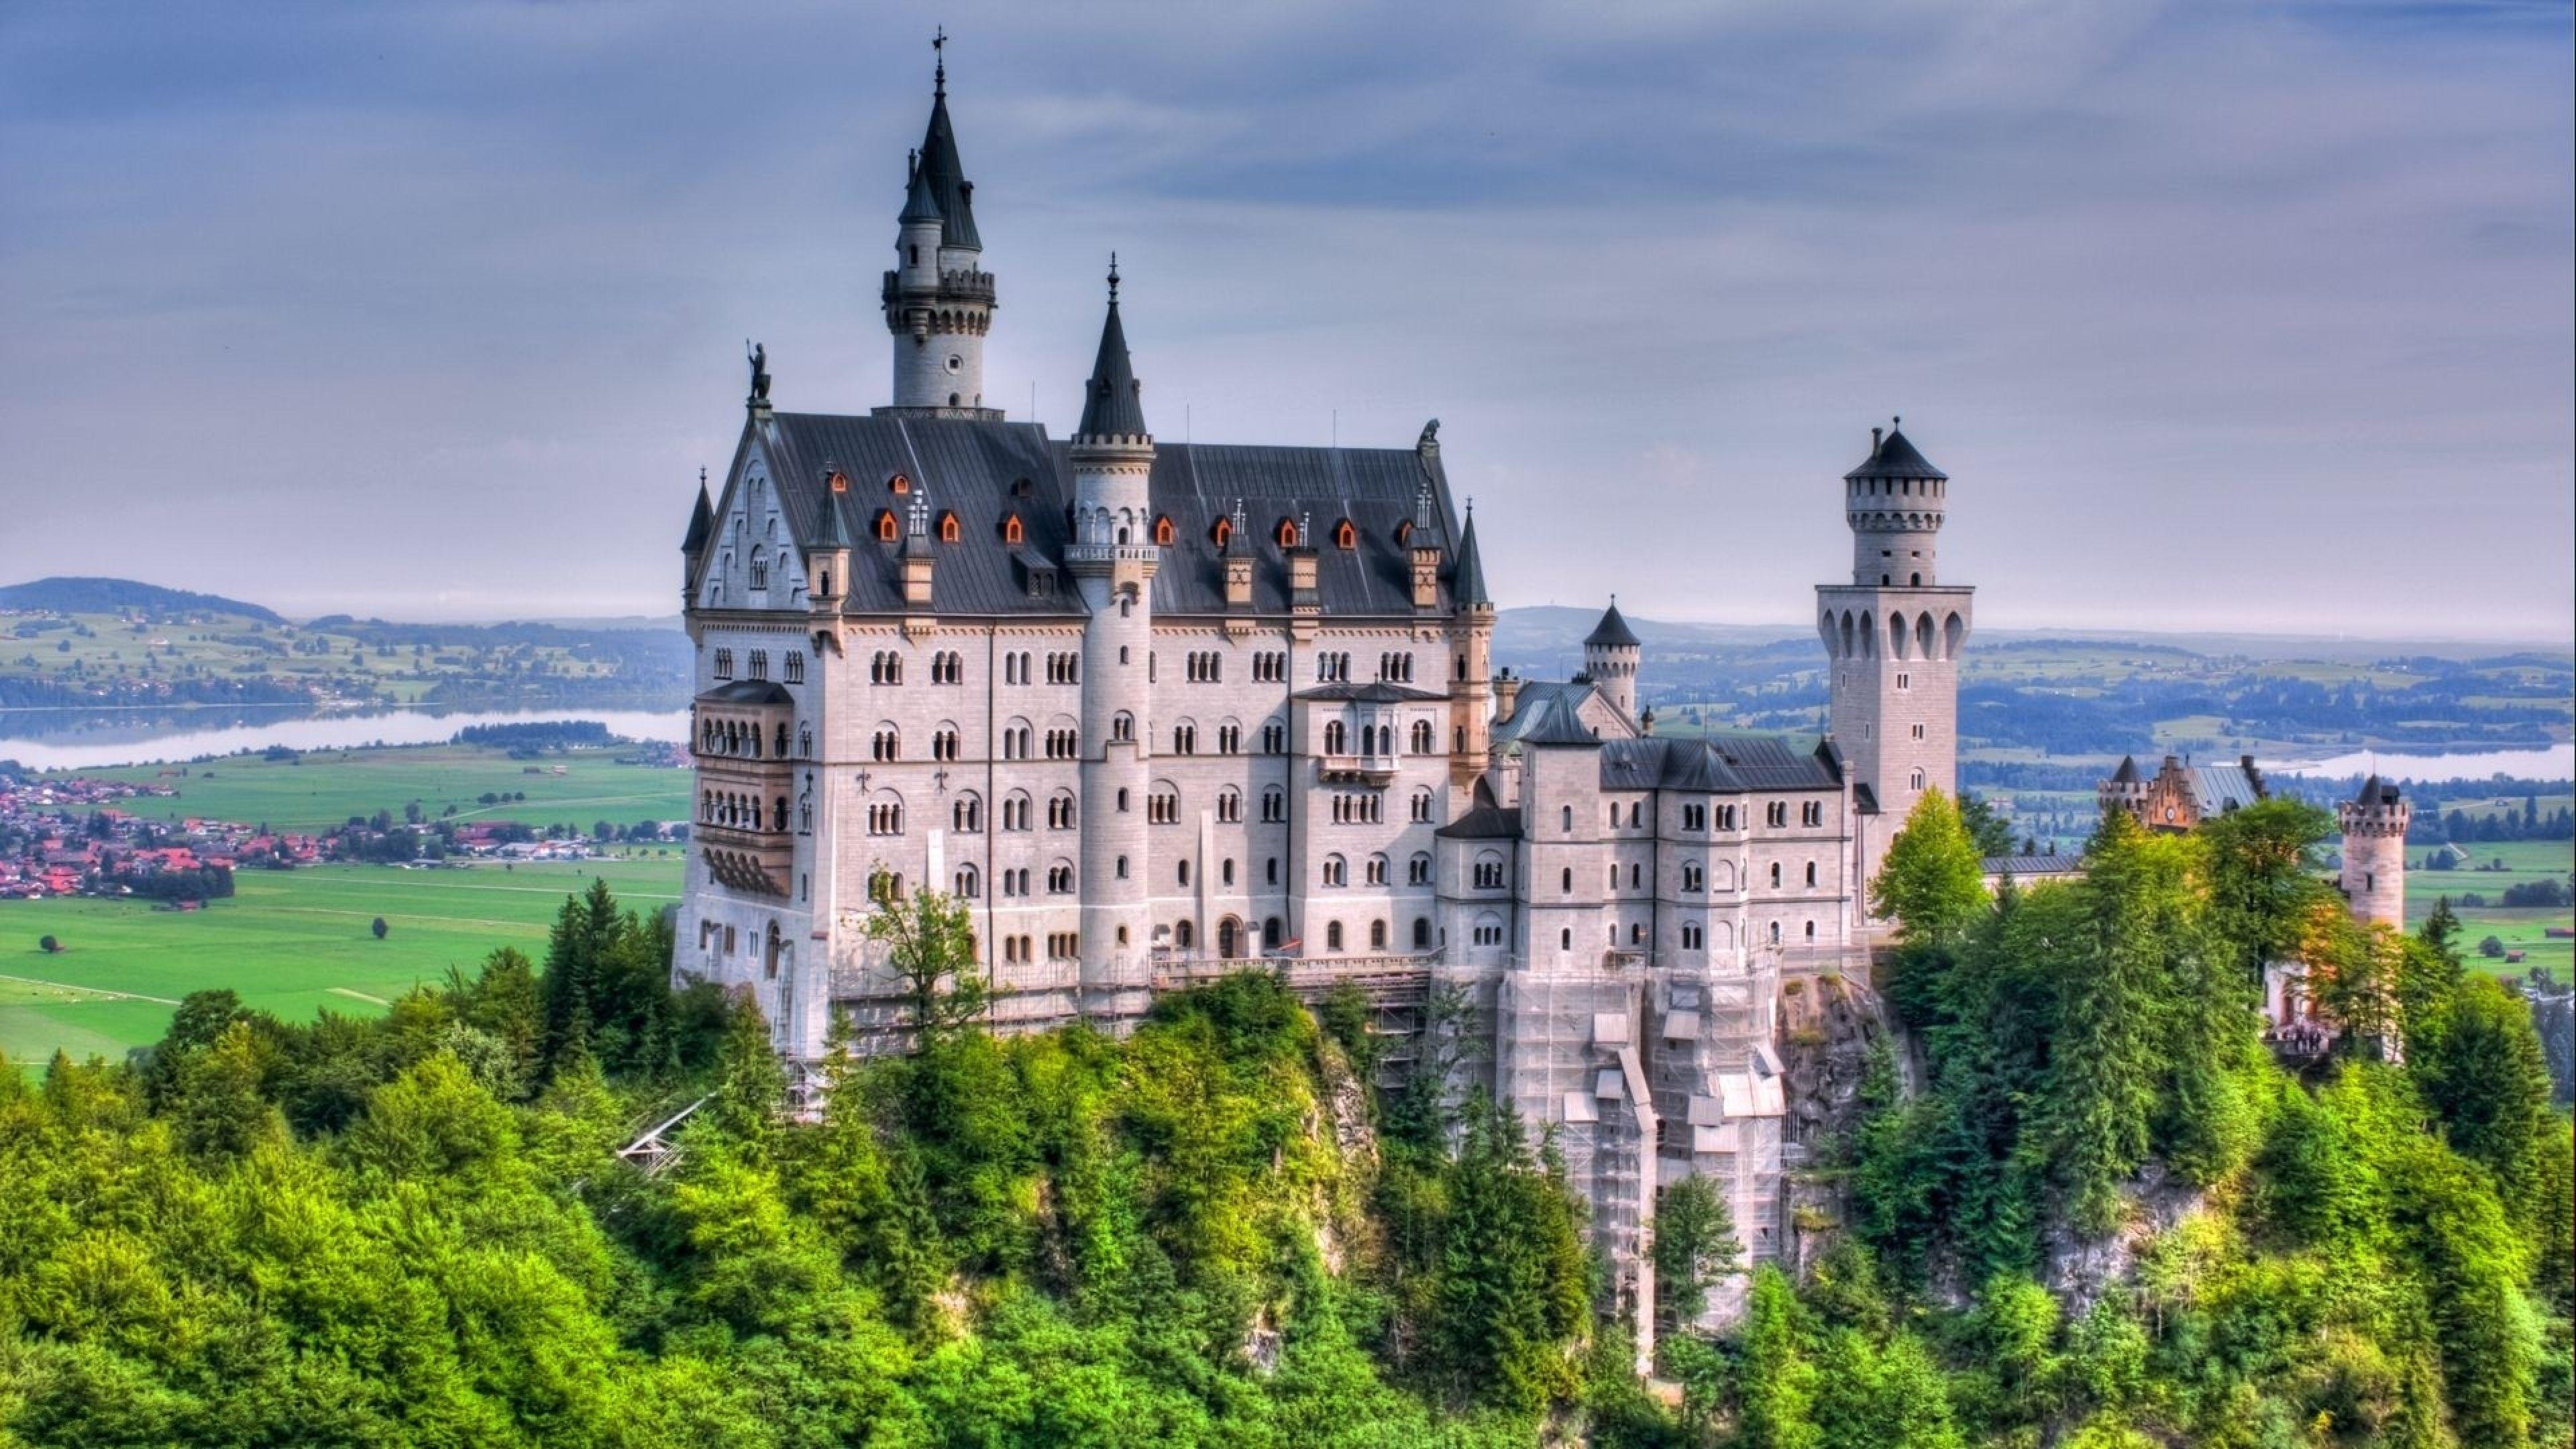 Castle Neuschwanstein 4k Ultra Hd Wallpaper Beautiful Castles Germany Castles Neuschwanstein Castle